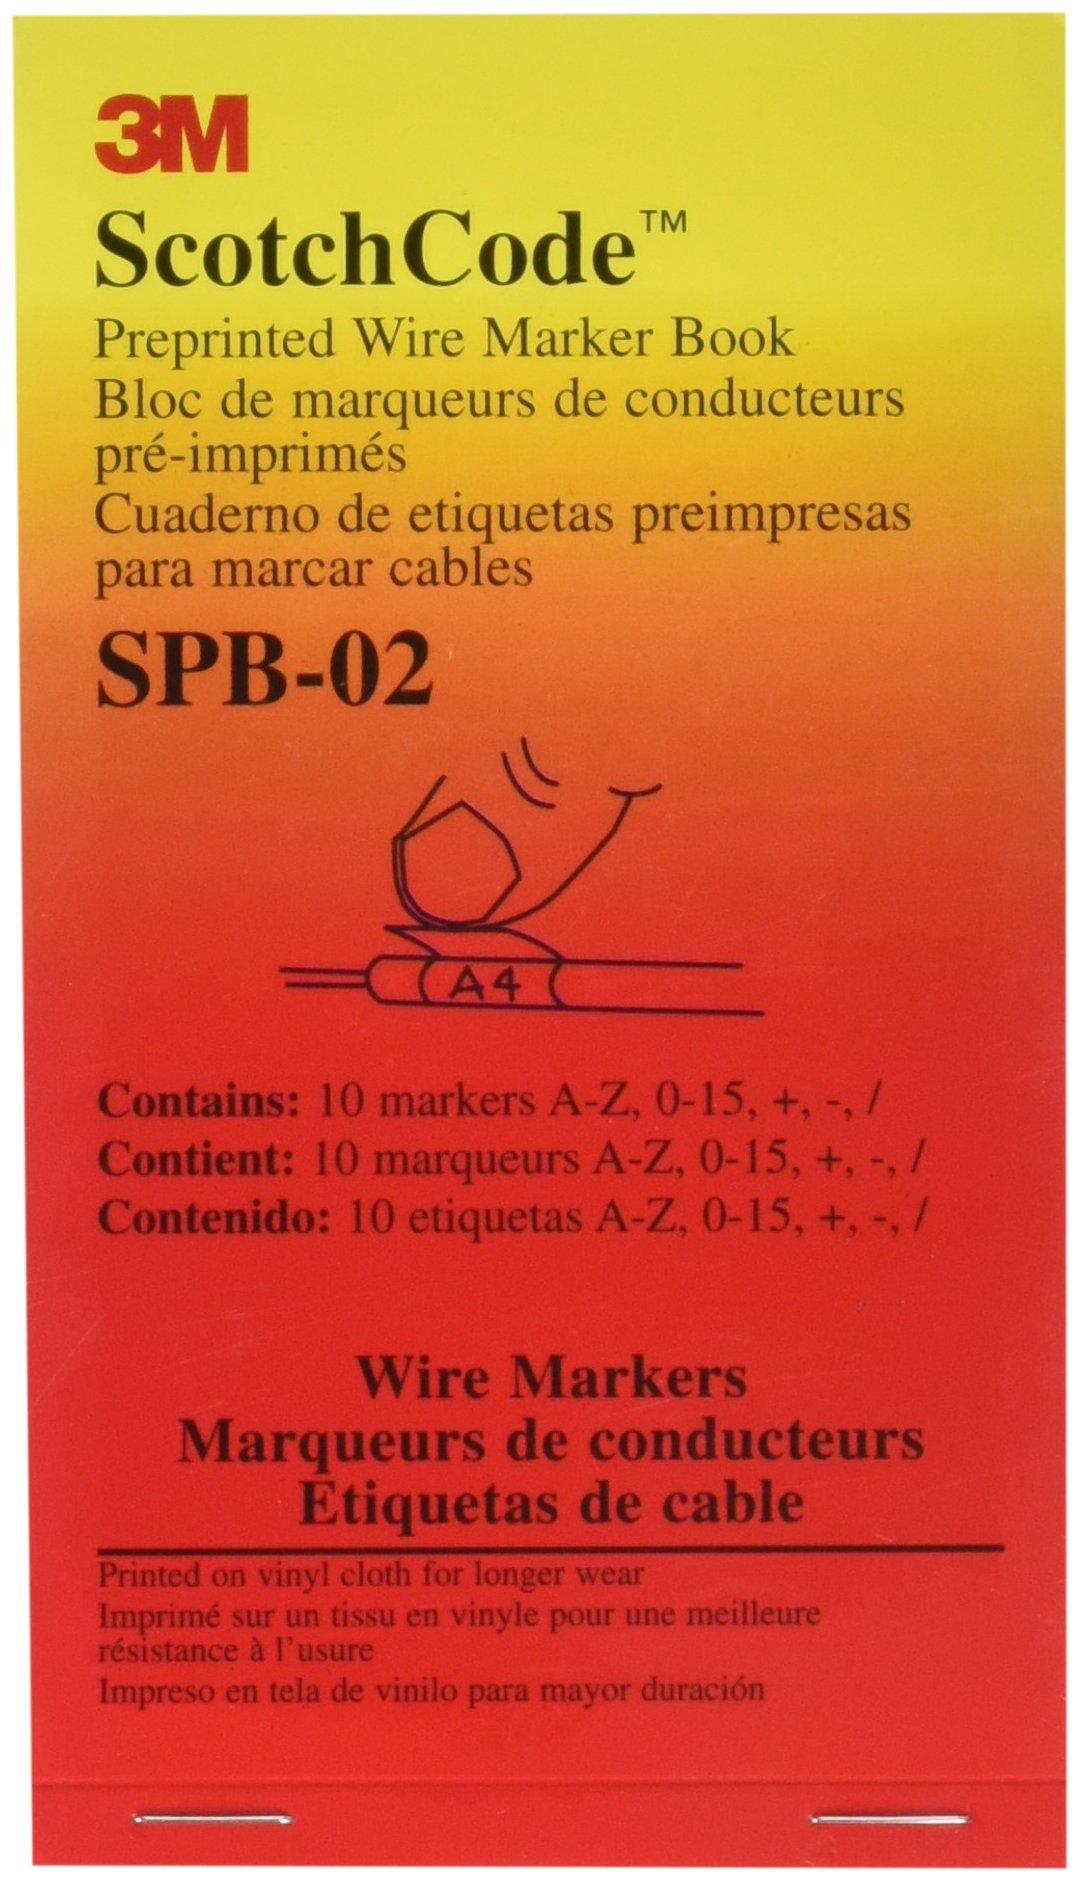 3M ScotchCode Pre-Printed Wire Marker Book